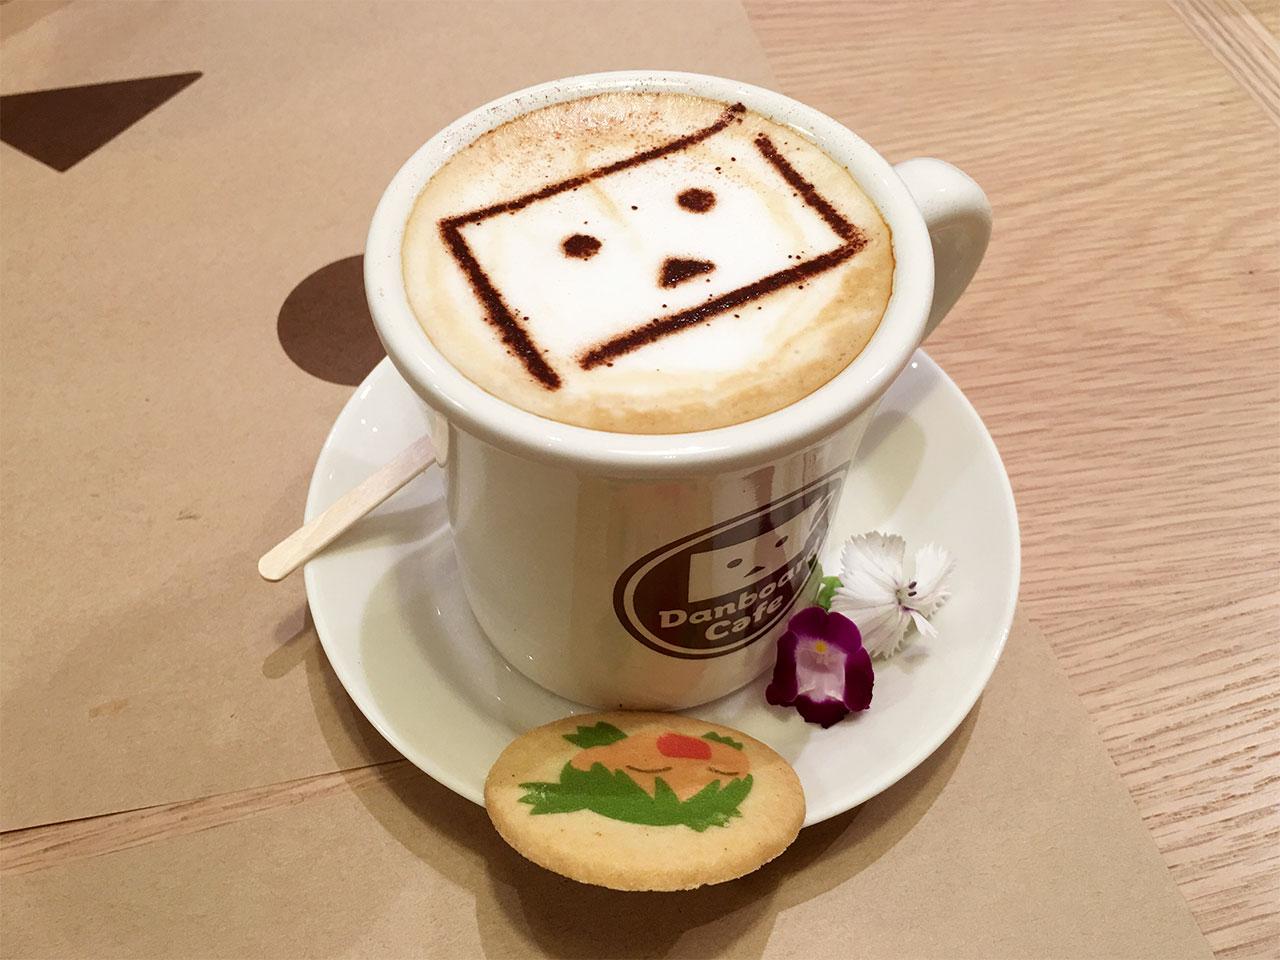 tachikawa-danboard-cafe-drink01